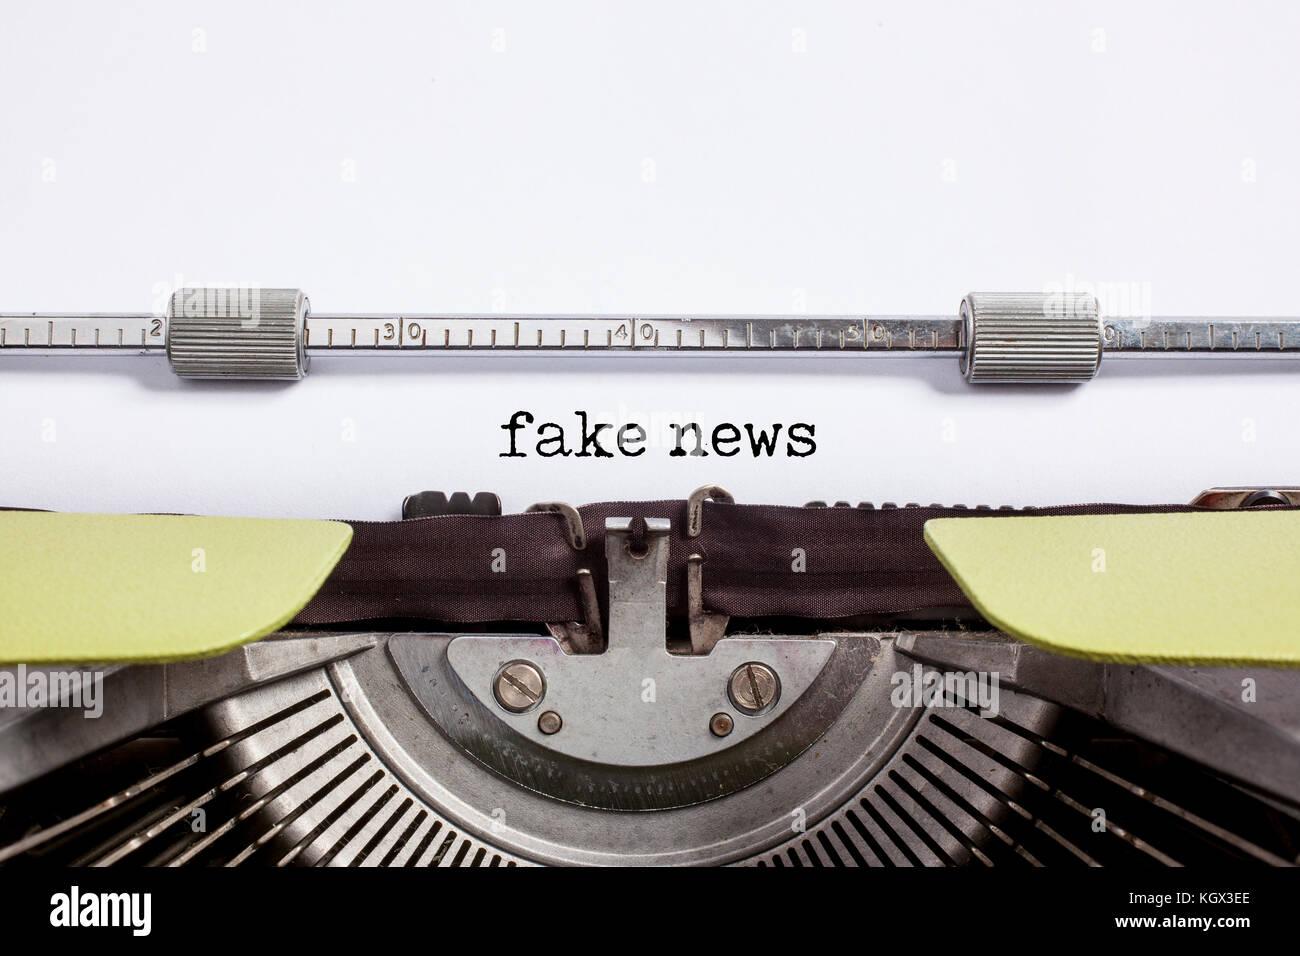 Fake news - typewrite Immagini Stock